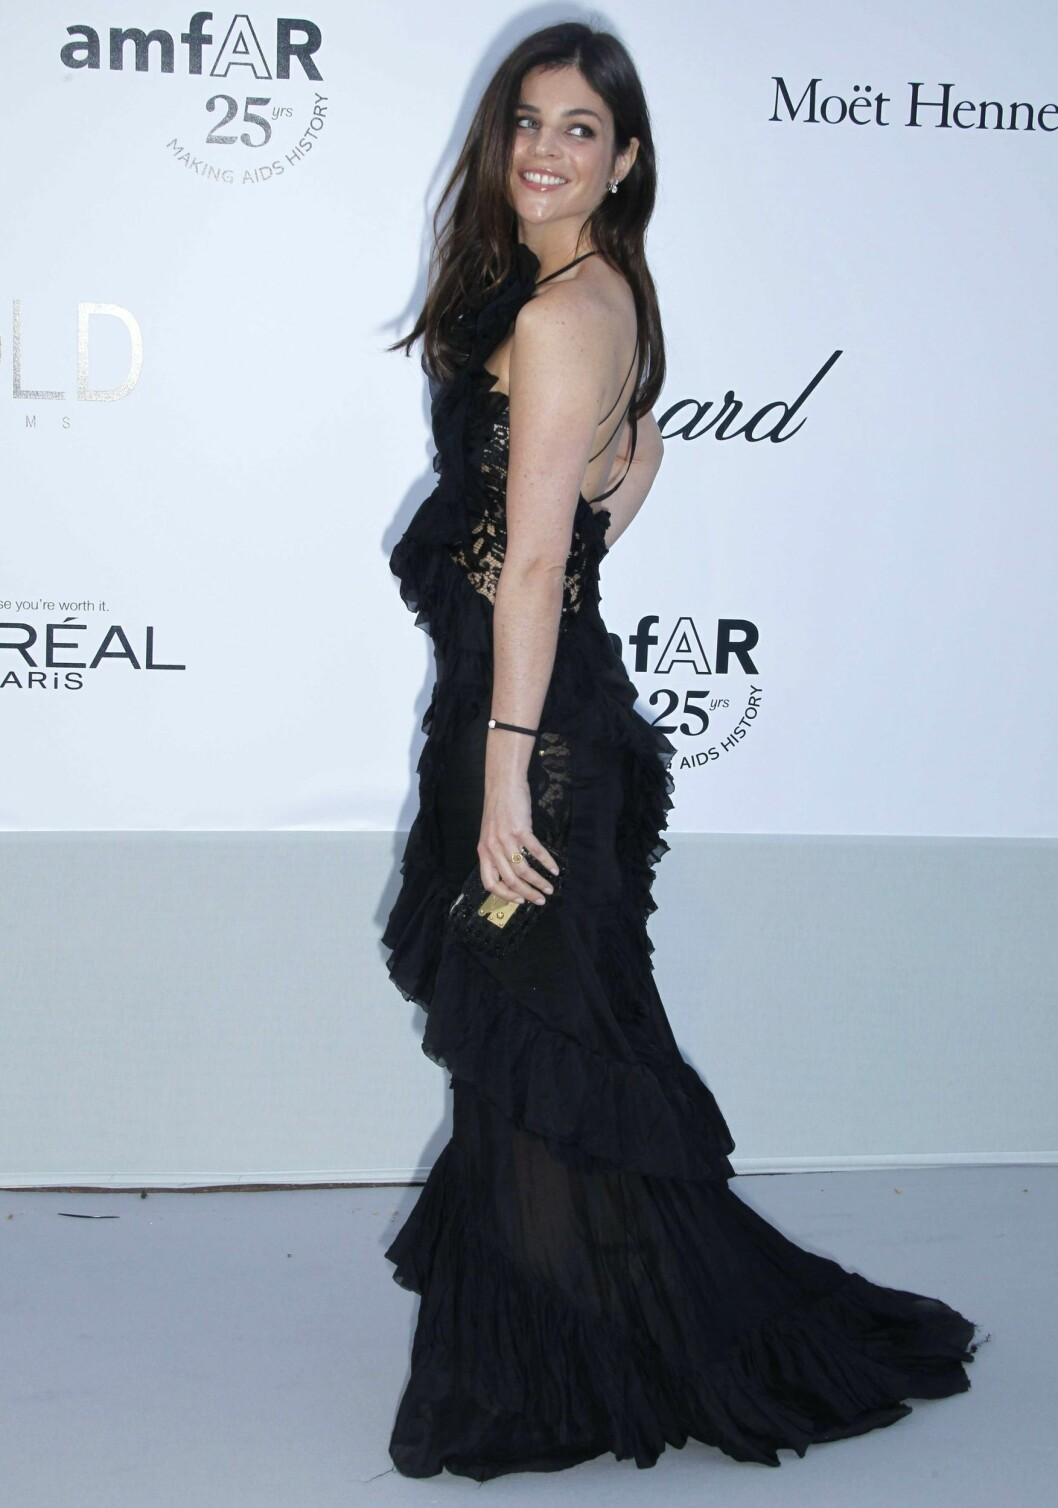 Modell og og it-jente Julia Restoin Roitfeld på amfARs Cinema Against AIDS Gala i Cannes, i svart gallakjole fra Pucci. Foto: All Over Press